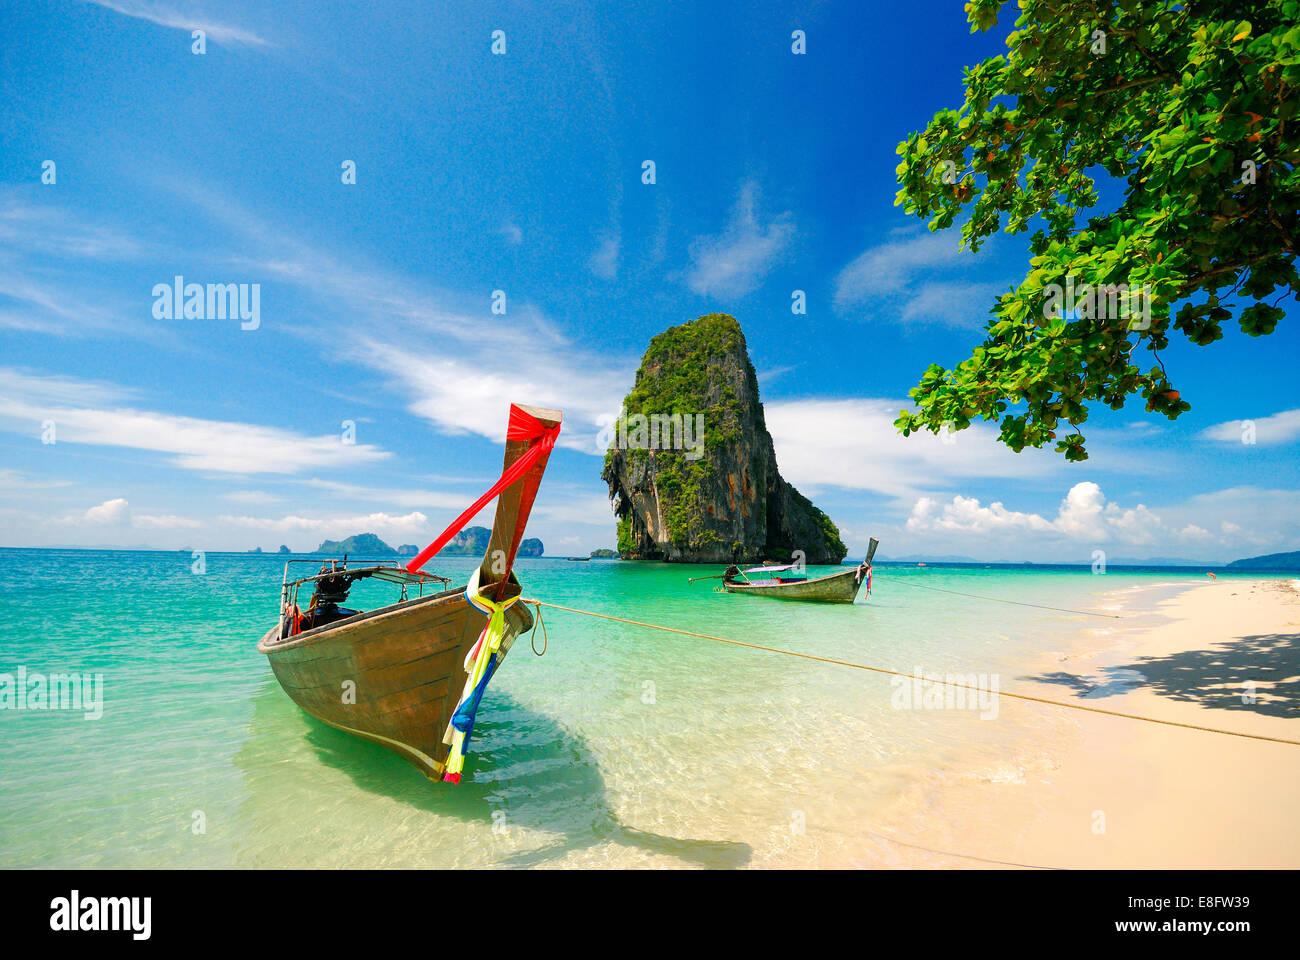 Thailand, Krabi, Boats on shore - Stock Image